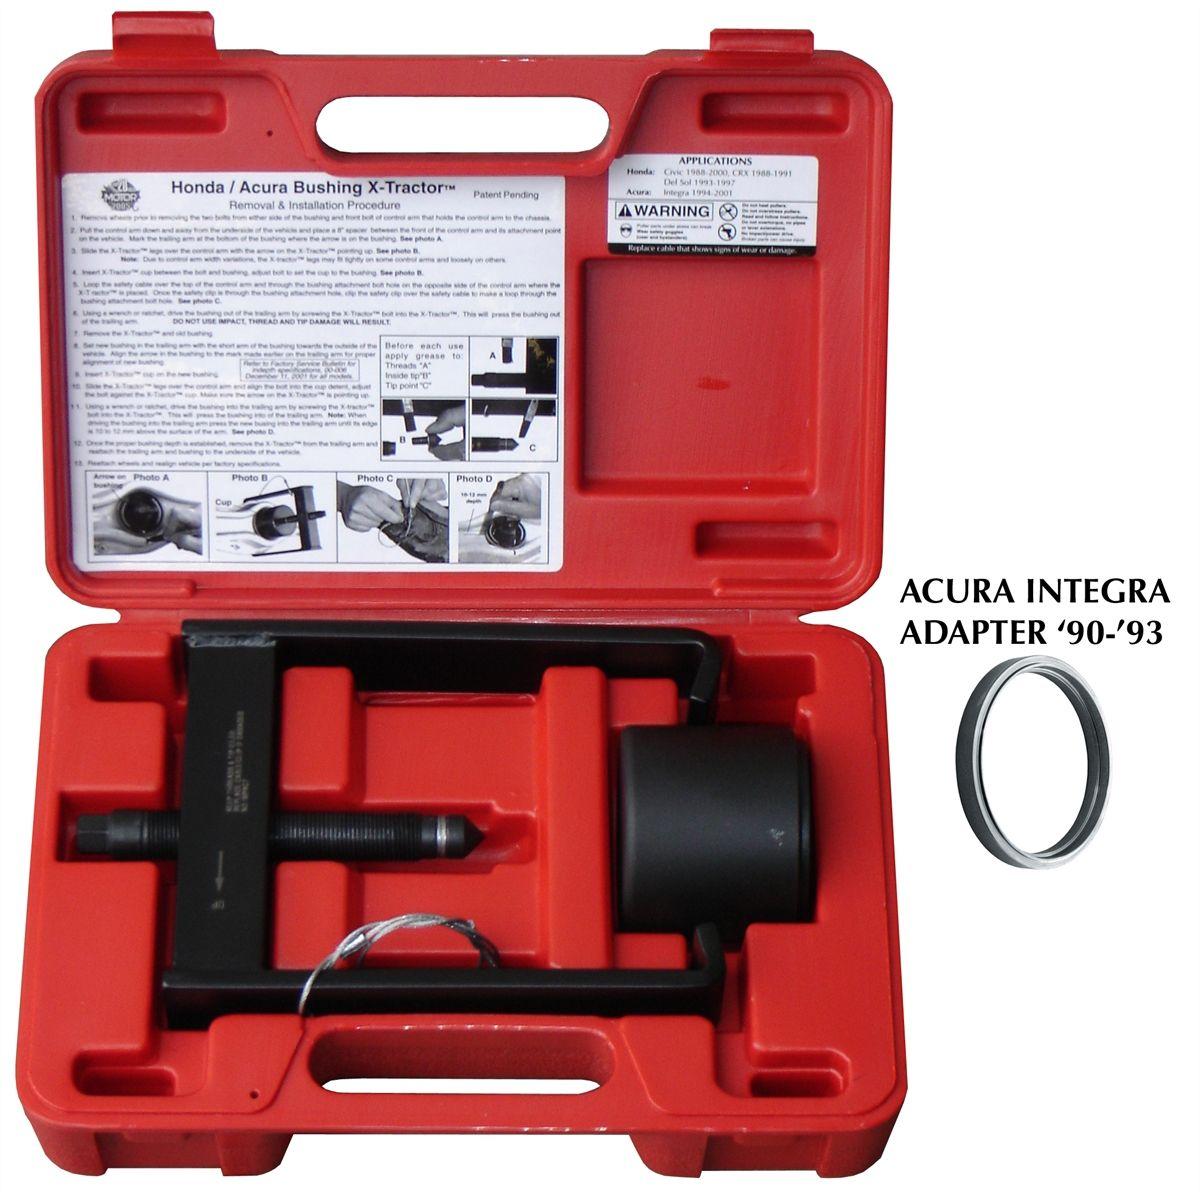 SP/Schley 65130 Honda/Acura Bushing X-Tractor SCH65130